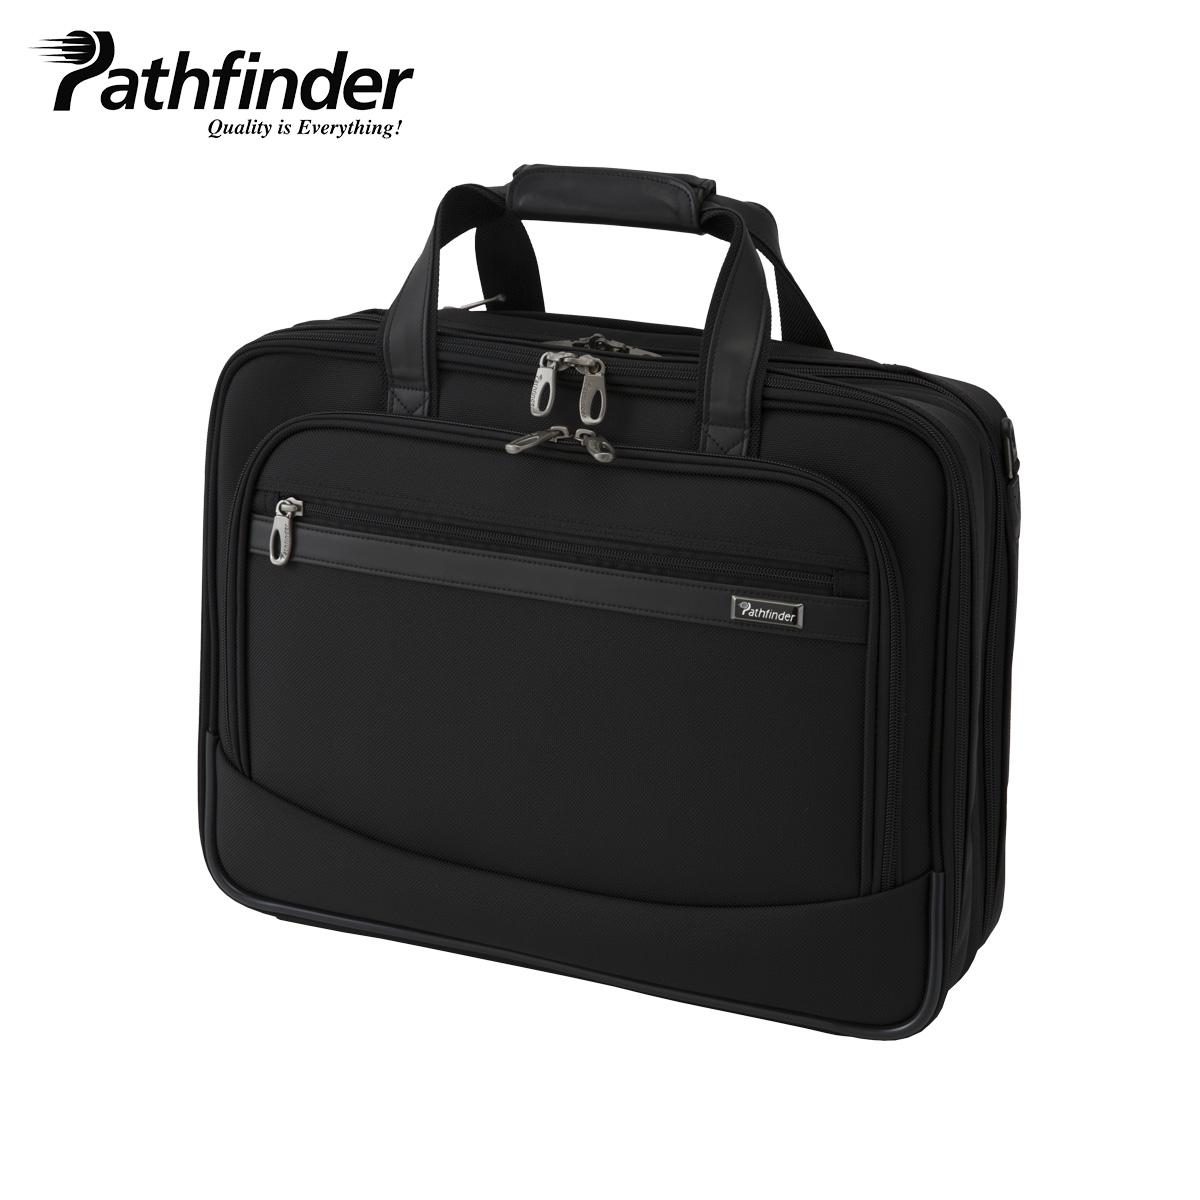 Pathfinder REVOLUTION XT パスファインダー バッグ ビジネスバッグ ブリーフケース ショルダー メンズ ブラック 黒 PF6804B